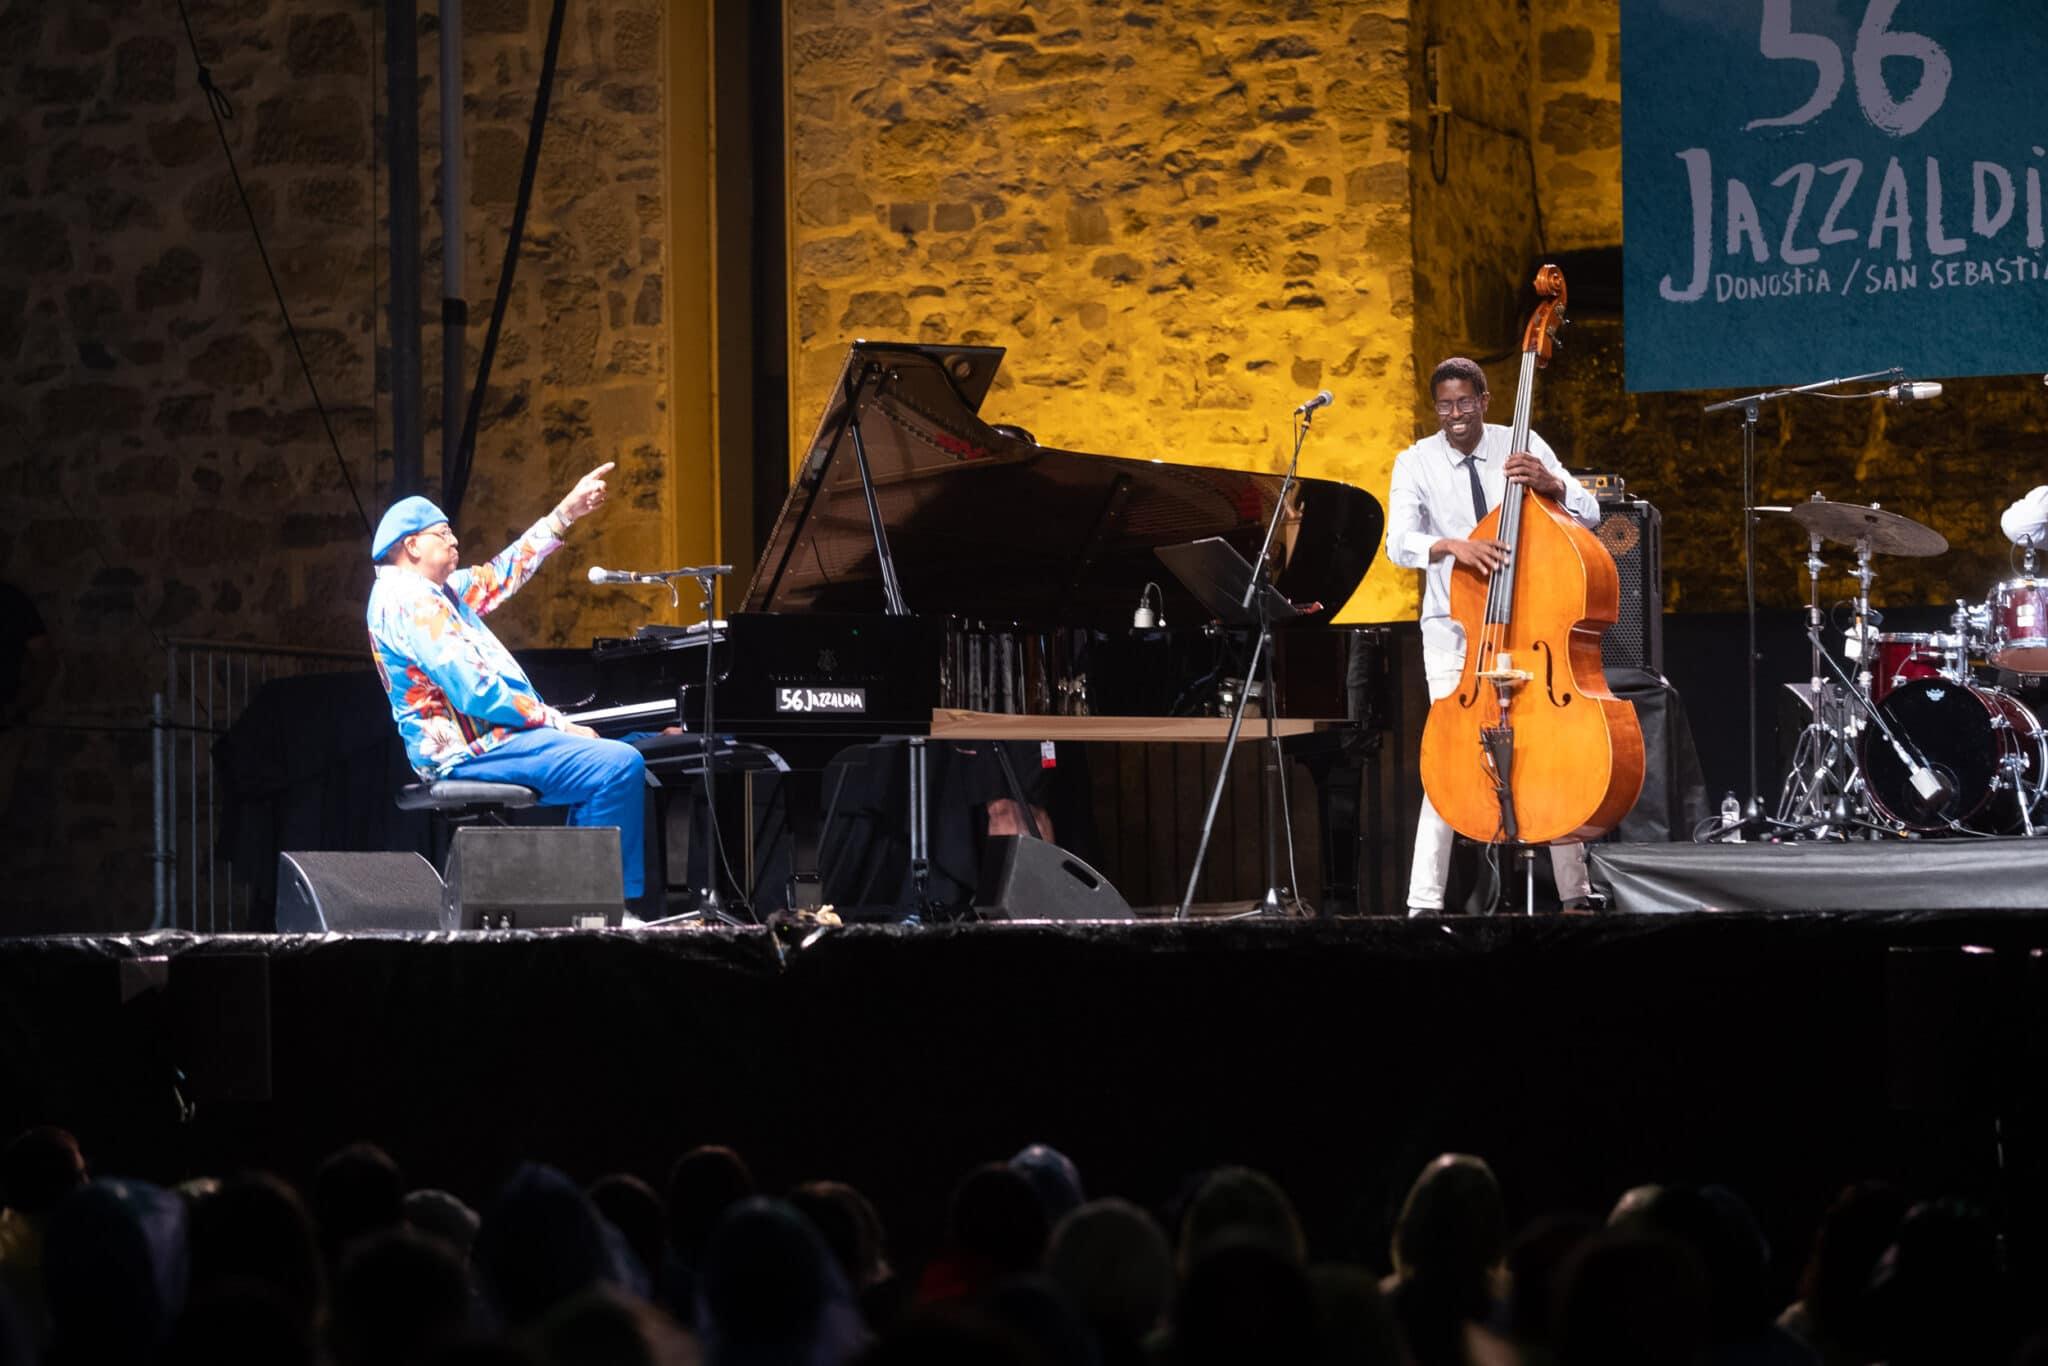 DSCF2309 scaled - Chucho Valdés recoge su premio Donostiako Jazzaldia